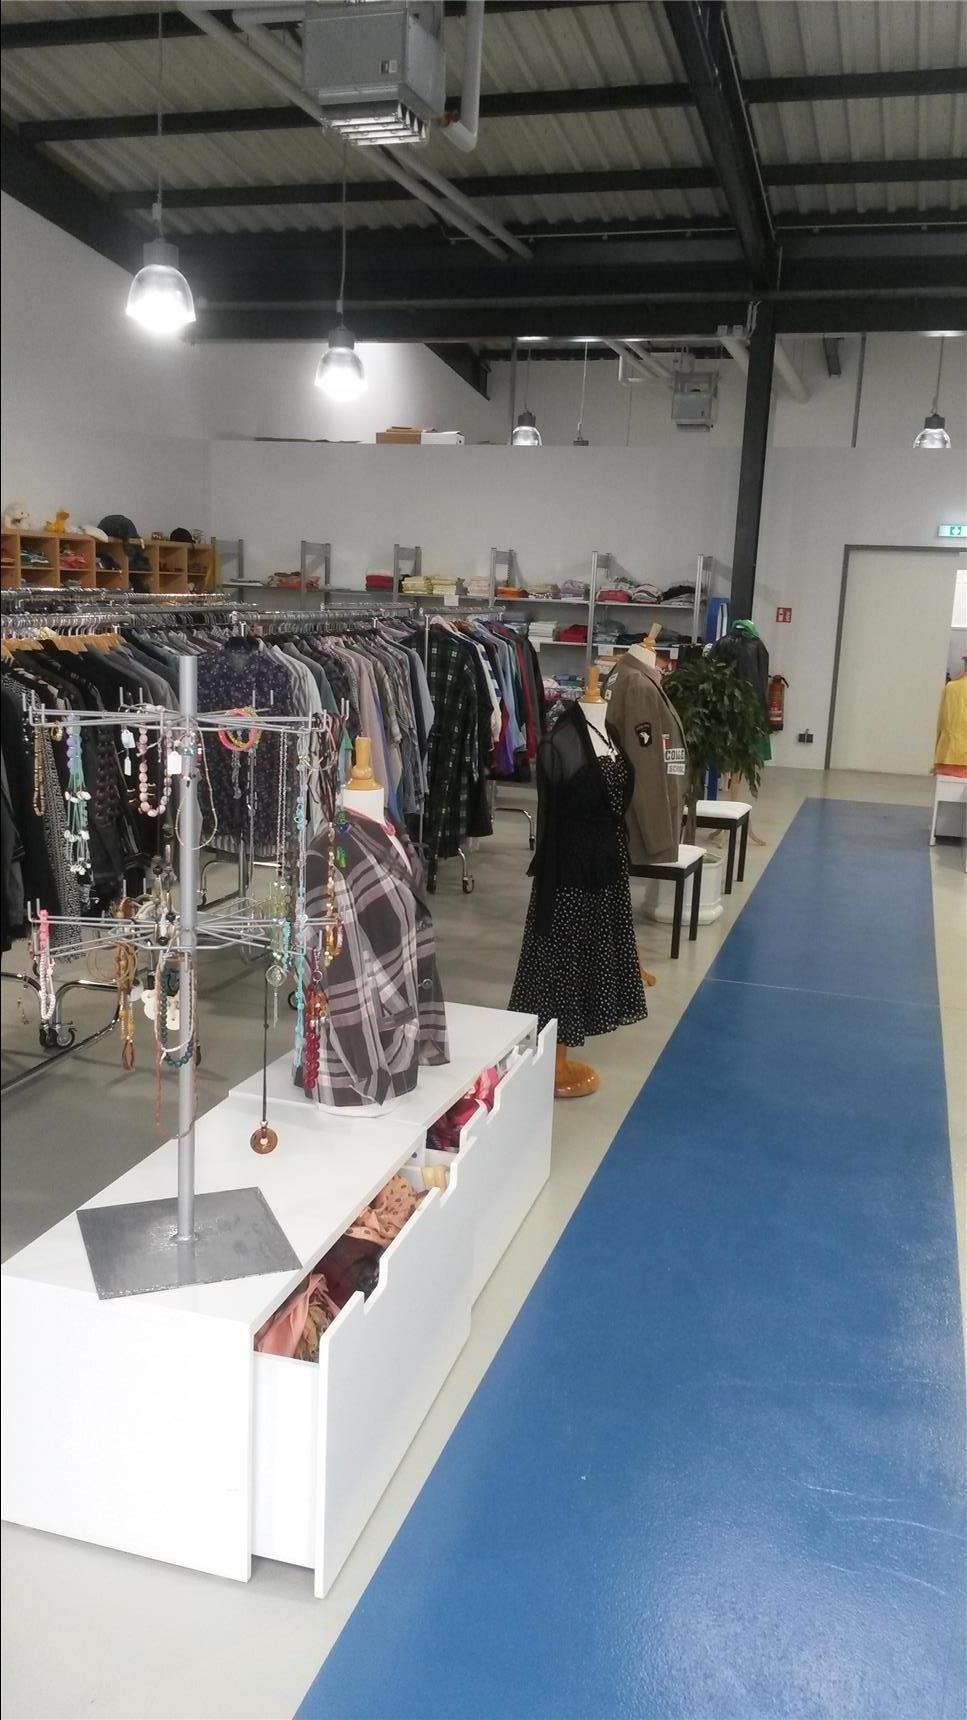 Mode Markt Caritas Krefeldde